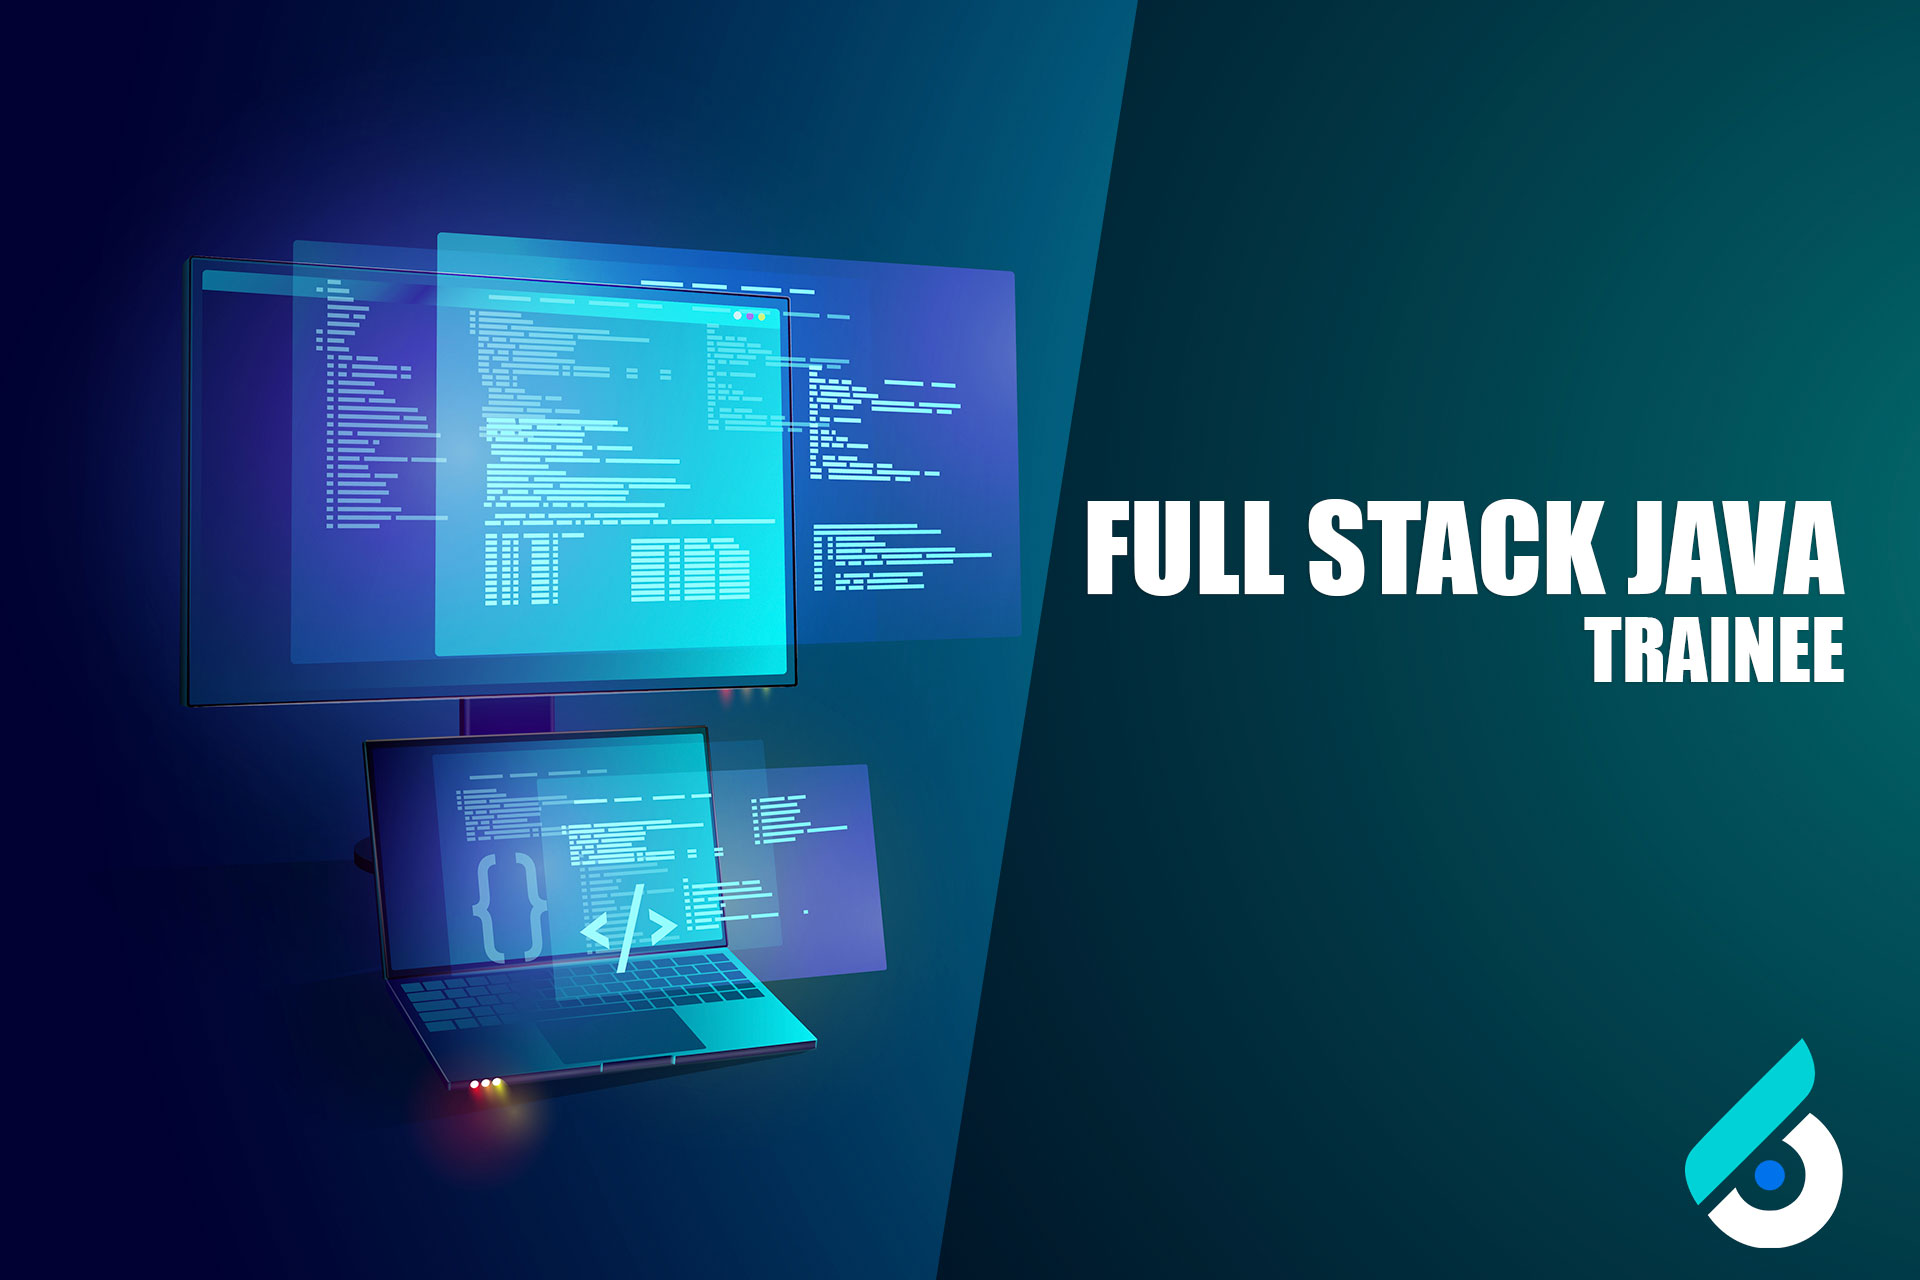 RLAB-20-01-13-0156-1 | Desarrollo de Aplicaciones Full Stack Java Trainee